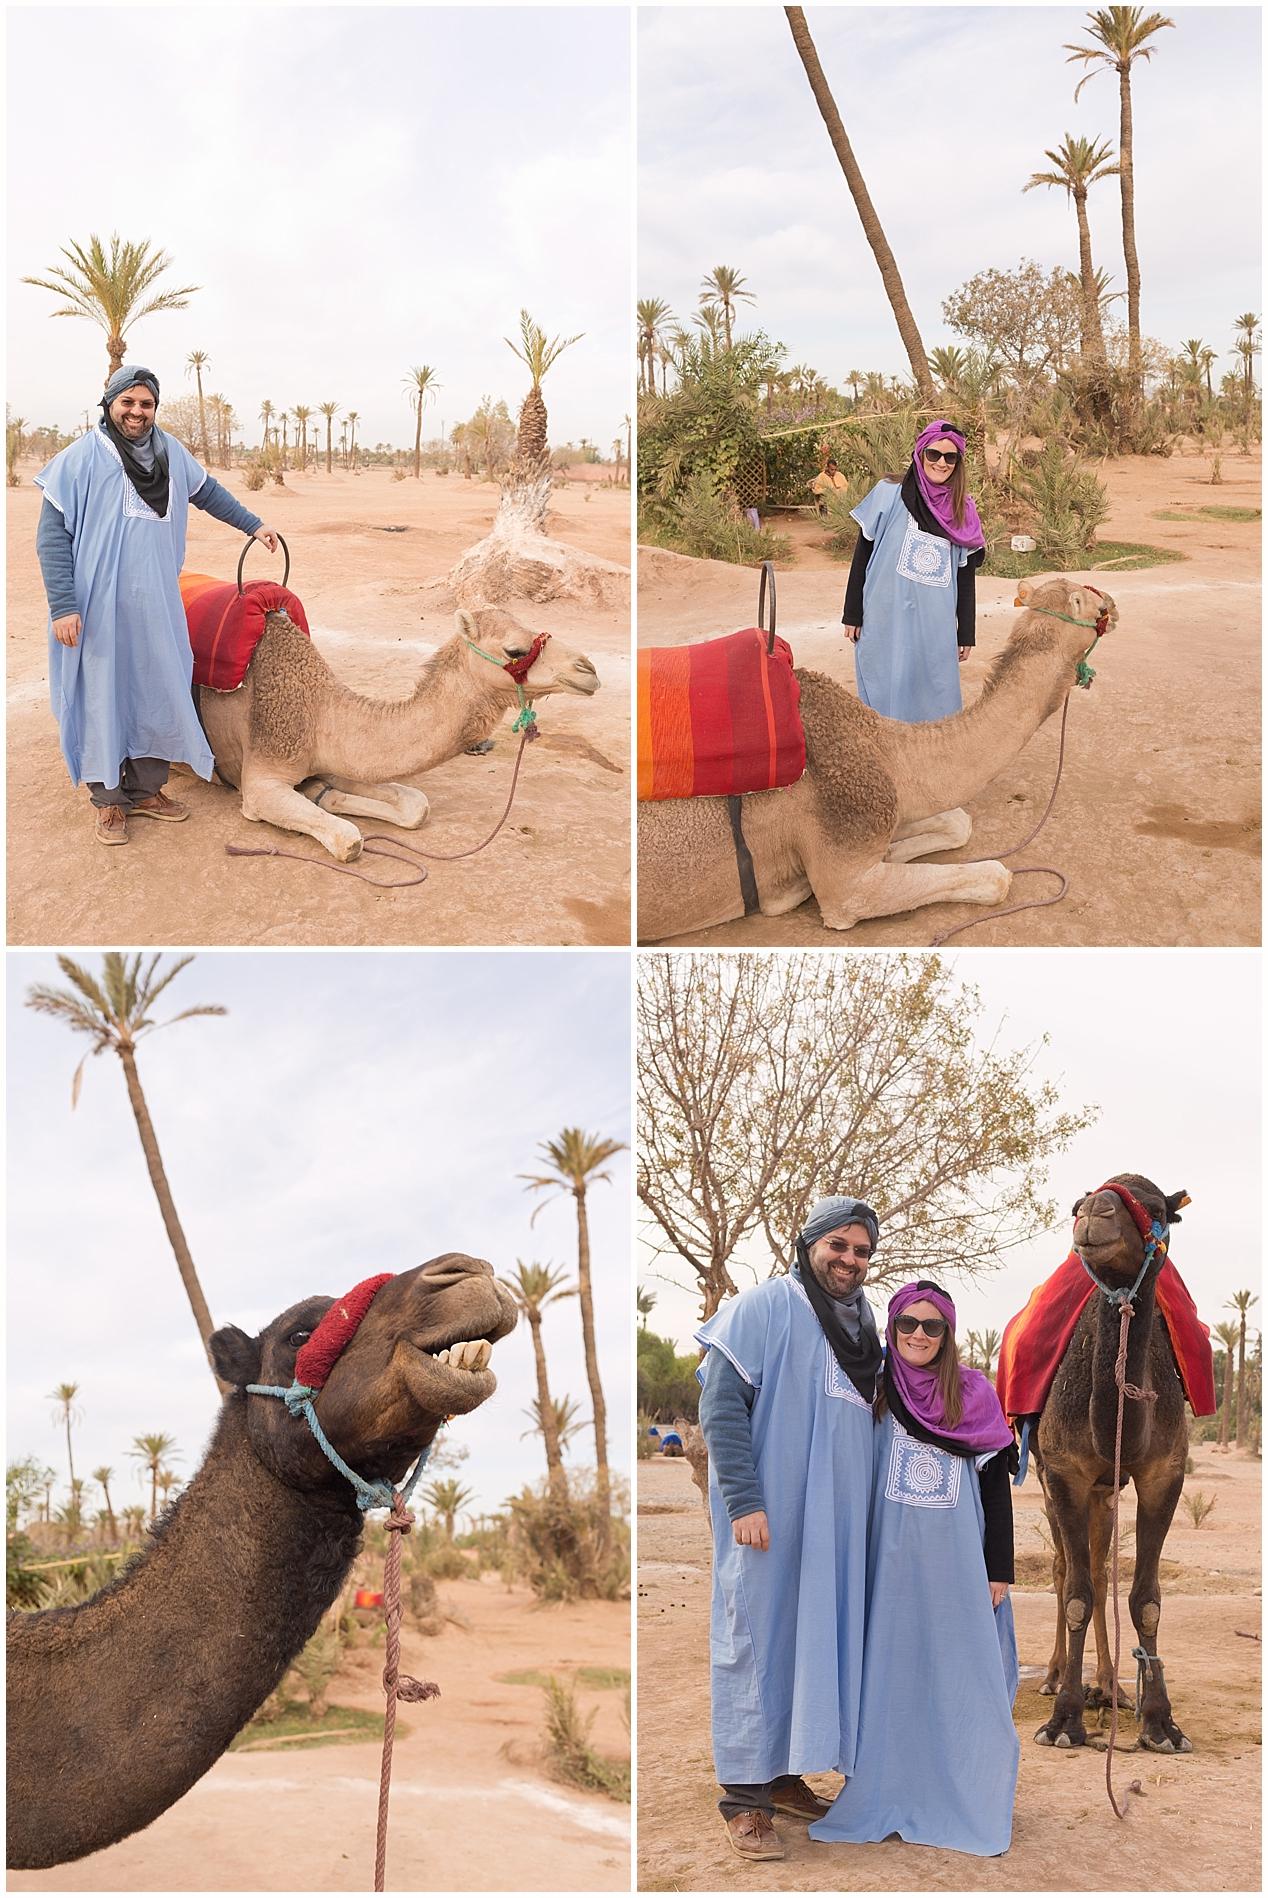 traditional attire for Moroccan camel ride - Marrakech, Morocco travel blog